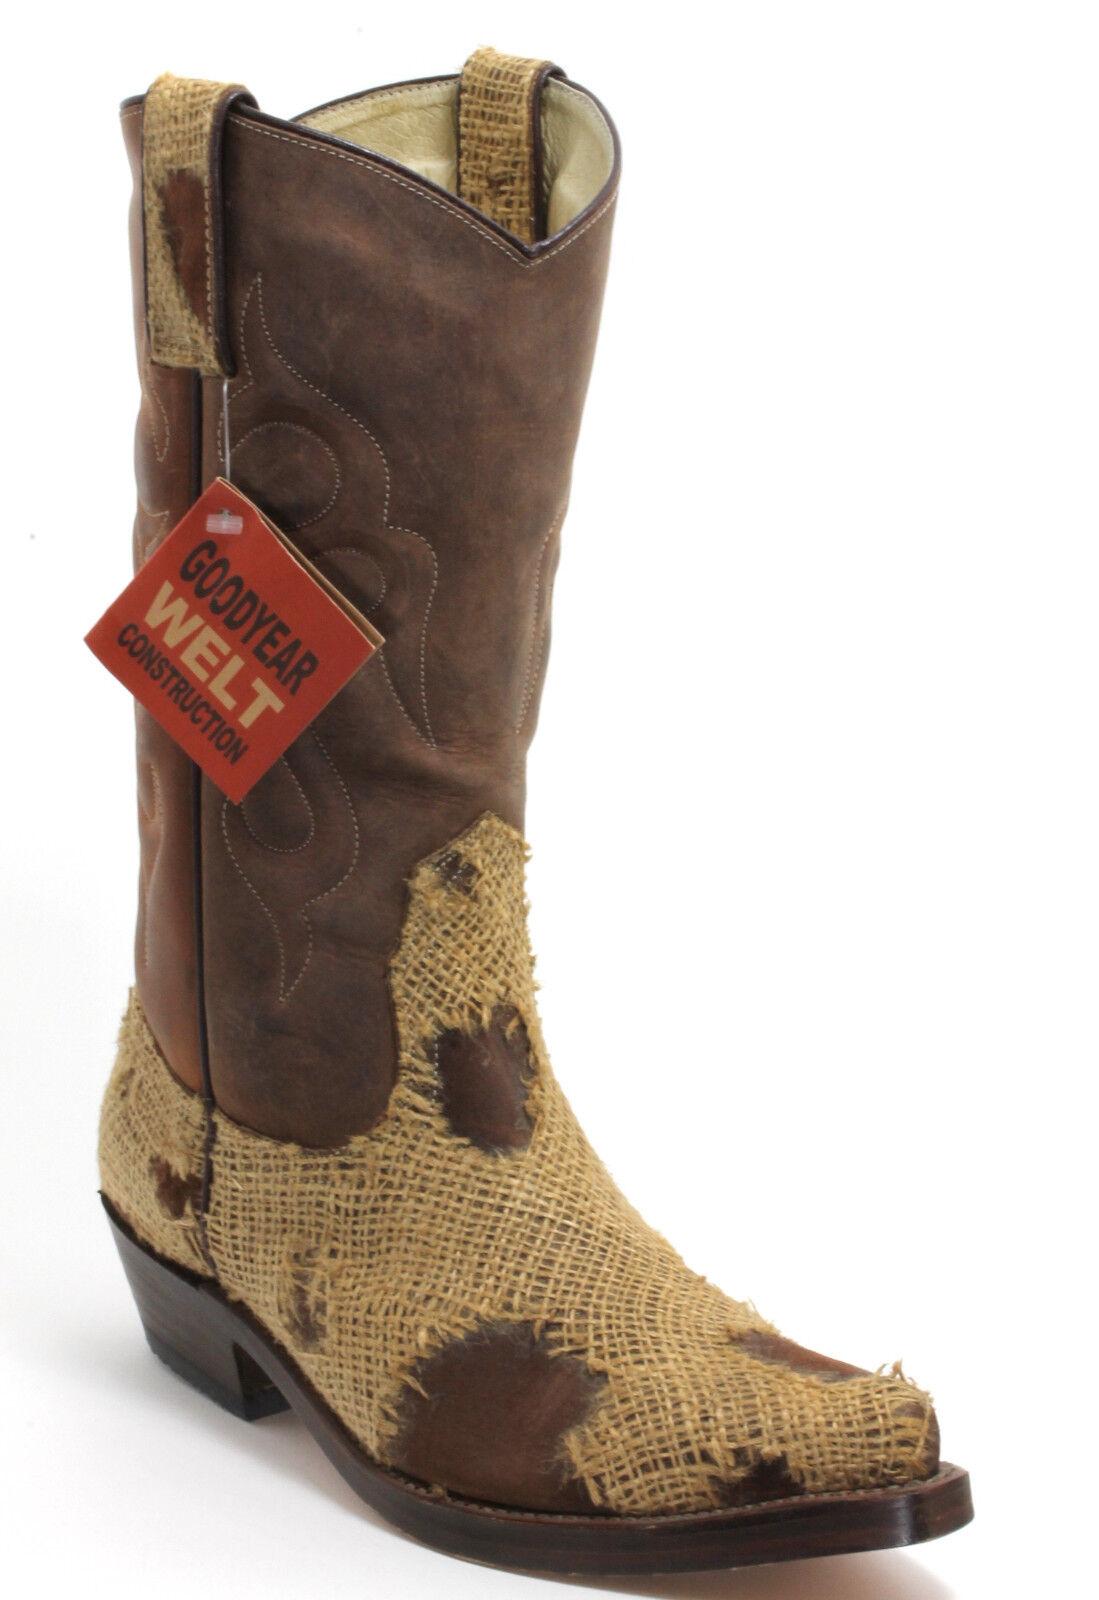 106 Cowboystiefel Westernstiefel Texas Catalan Style Fashion Tequila Stiefel 41